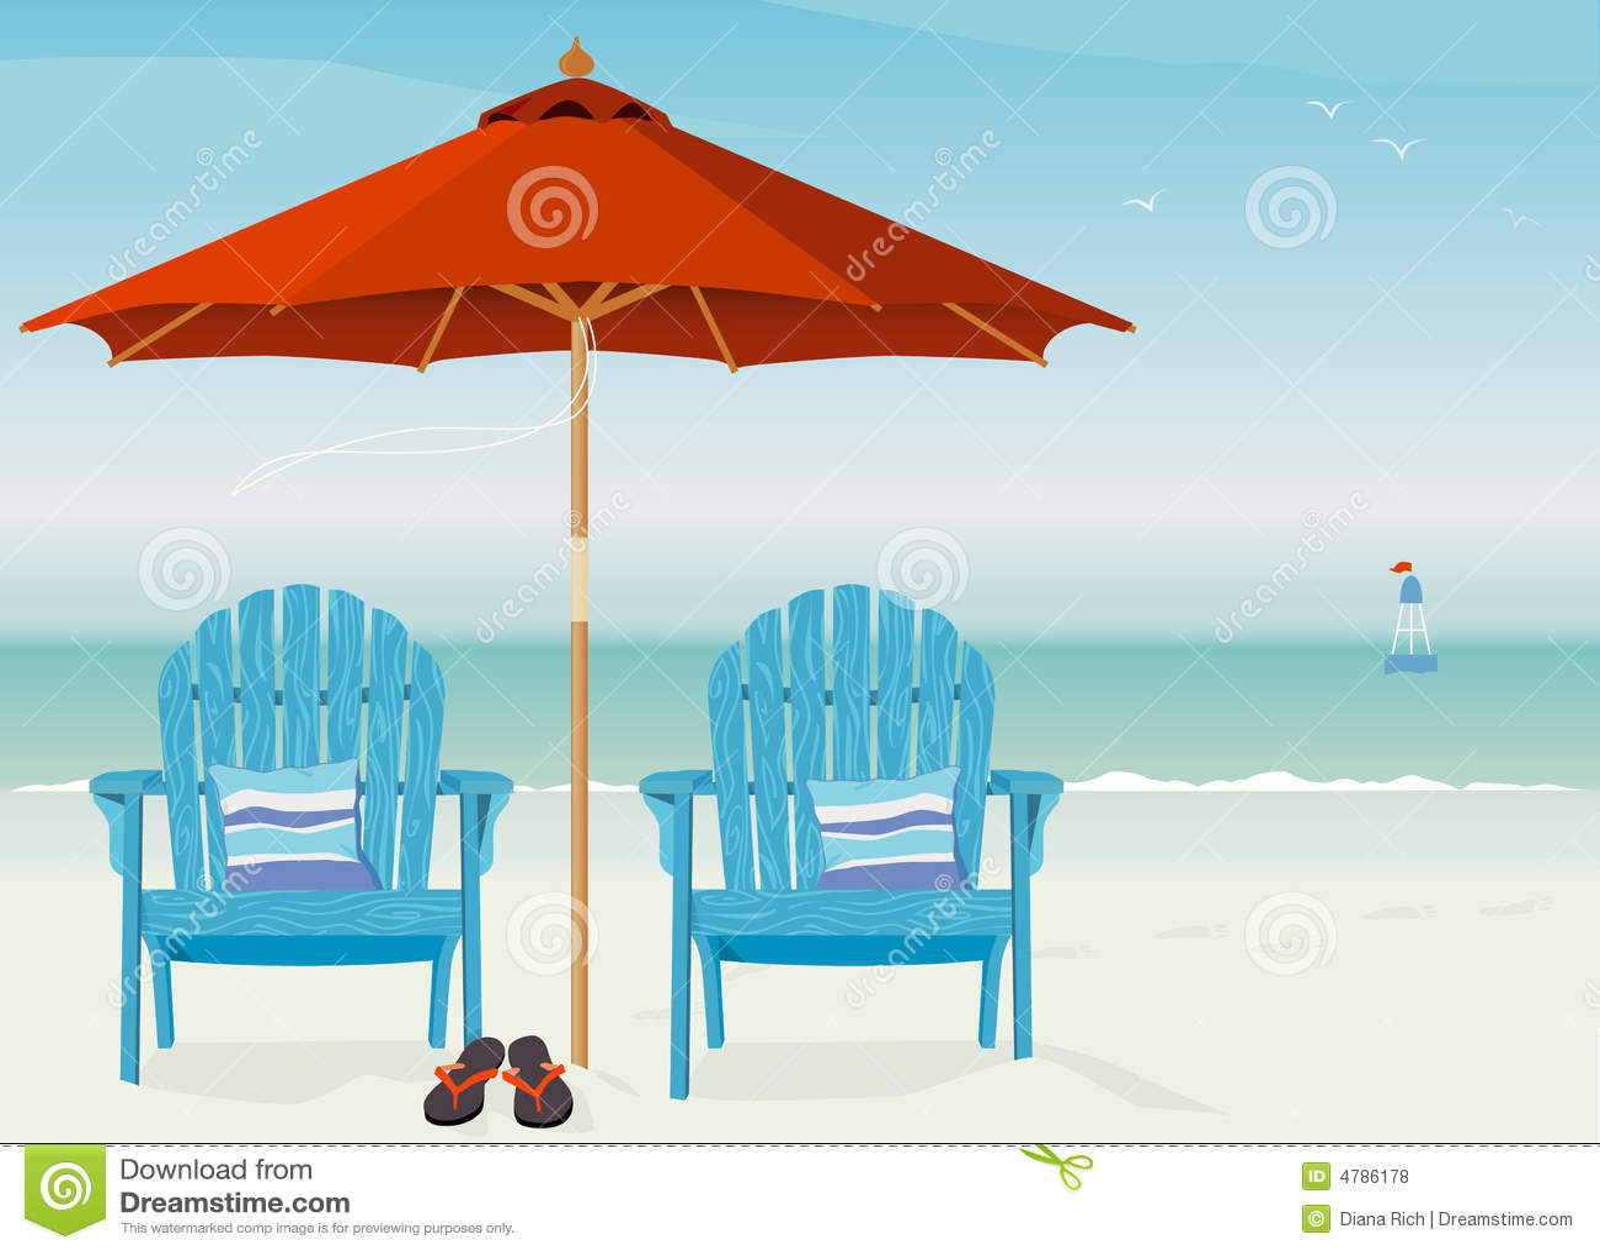 https://thumbs.dreamstime.com/z/adirondack-chairs-beach-4786178.jpg